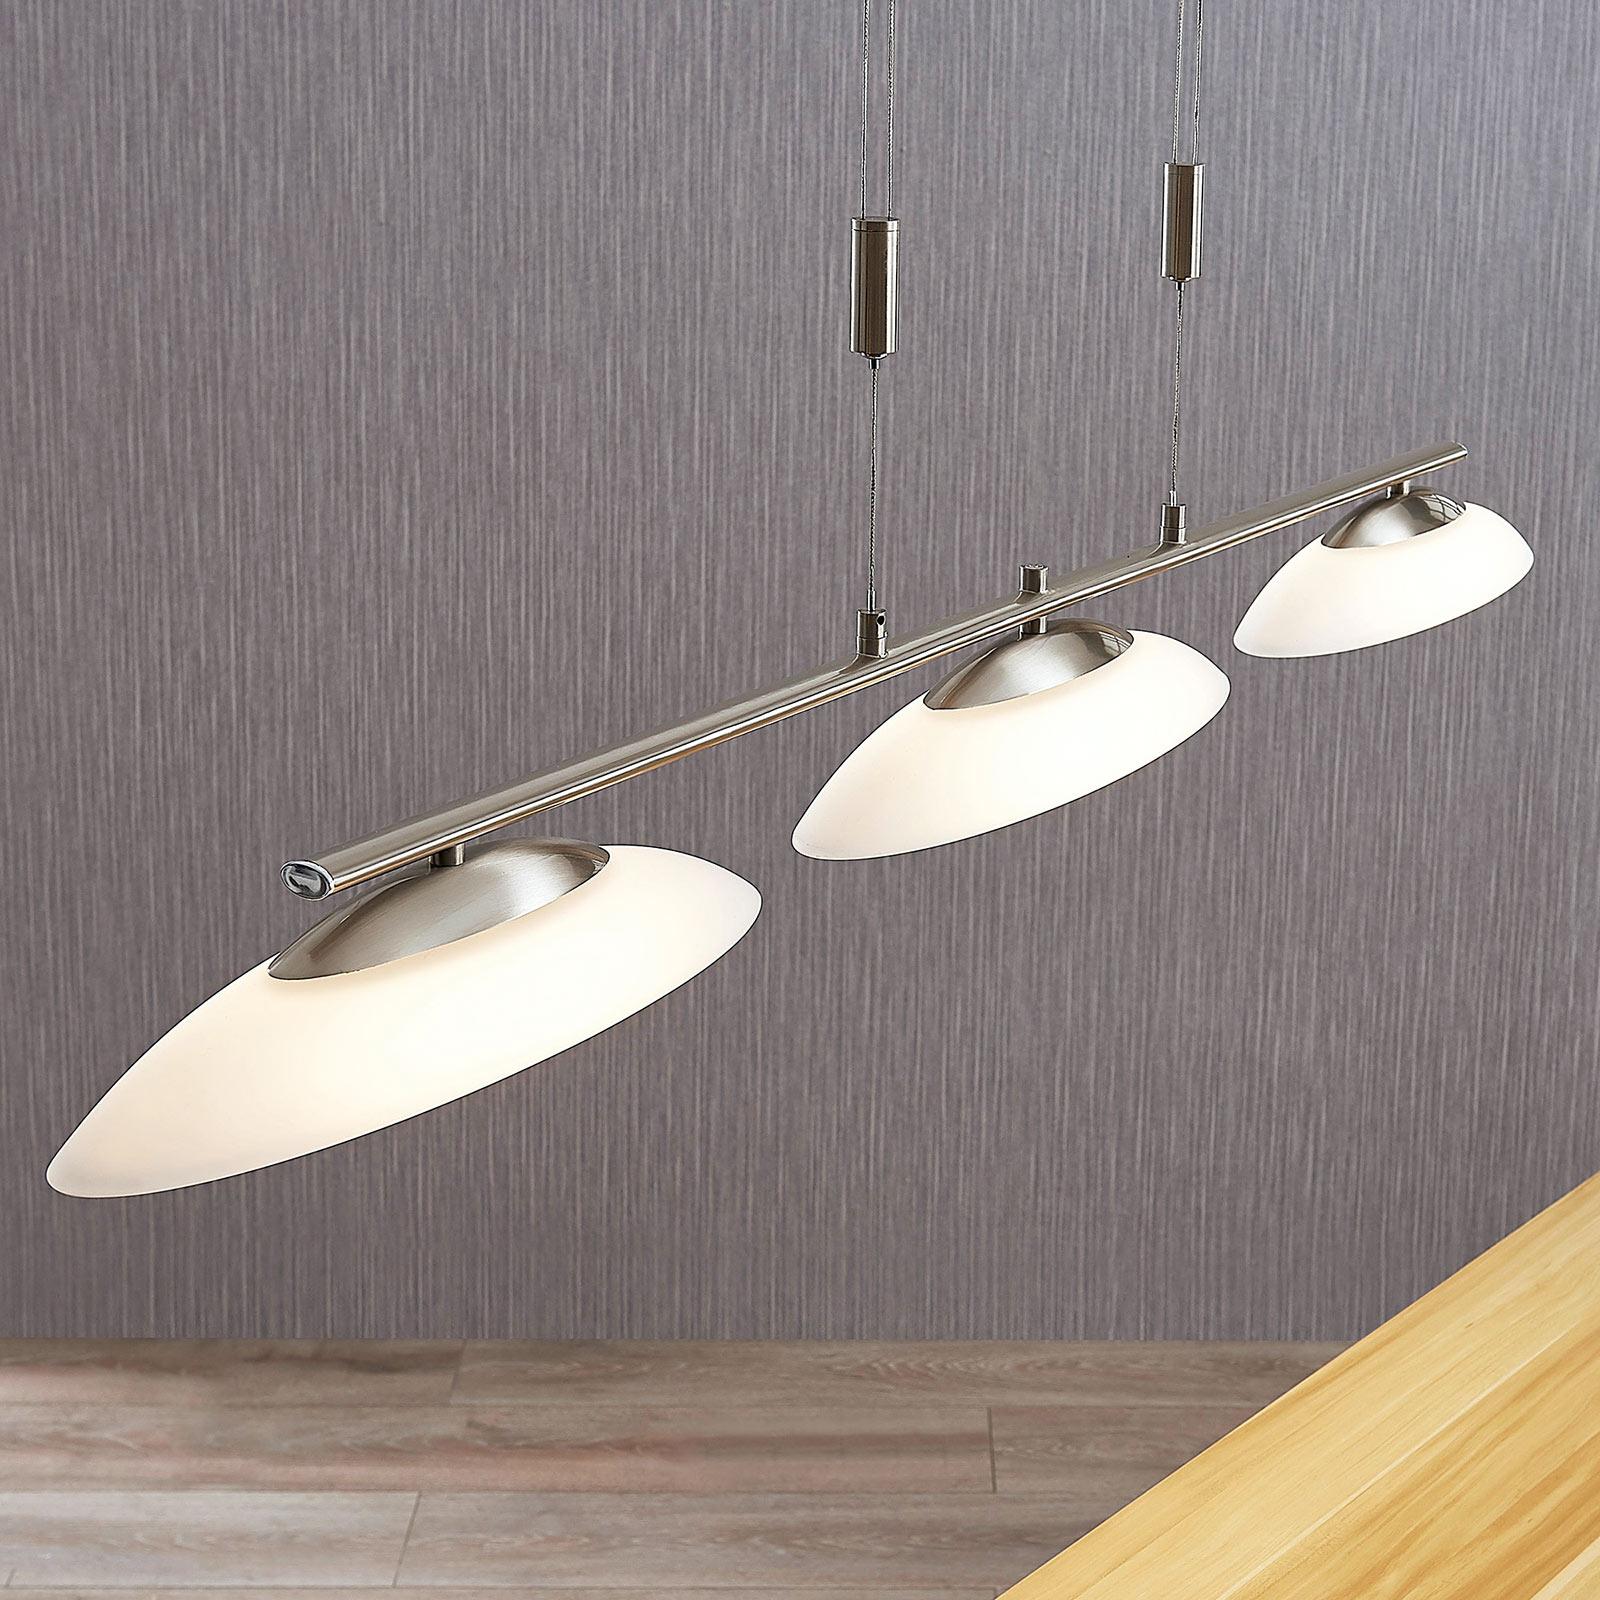 Judie - LED-pendellampe med dimmer og 3 lys